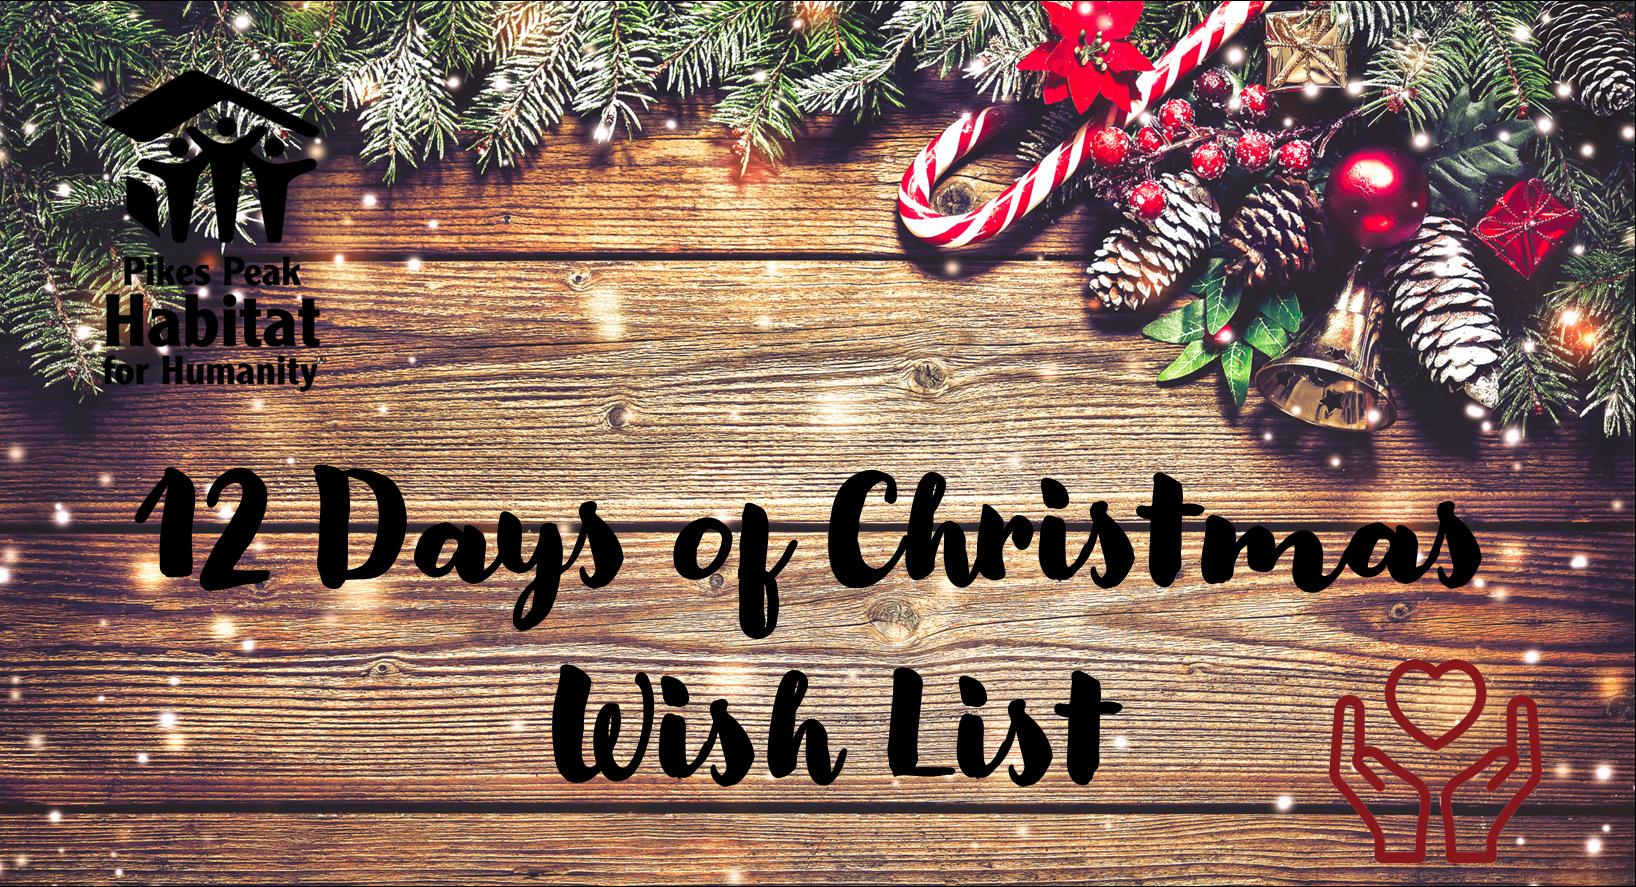 12 Days of Christmas Website Banner